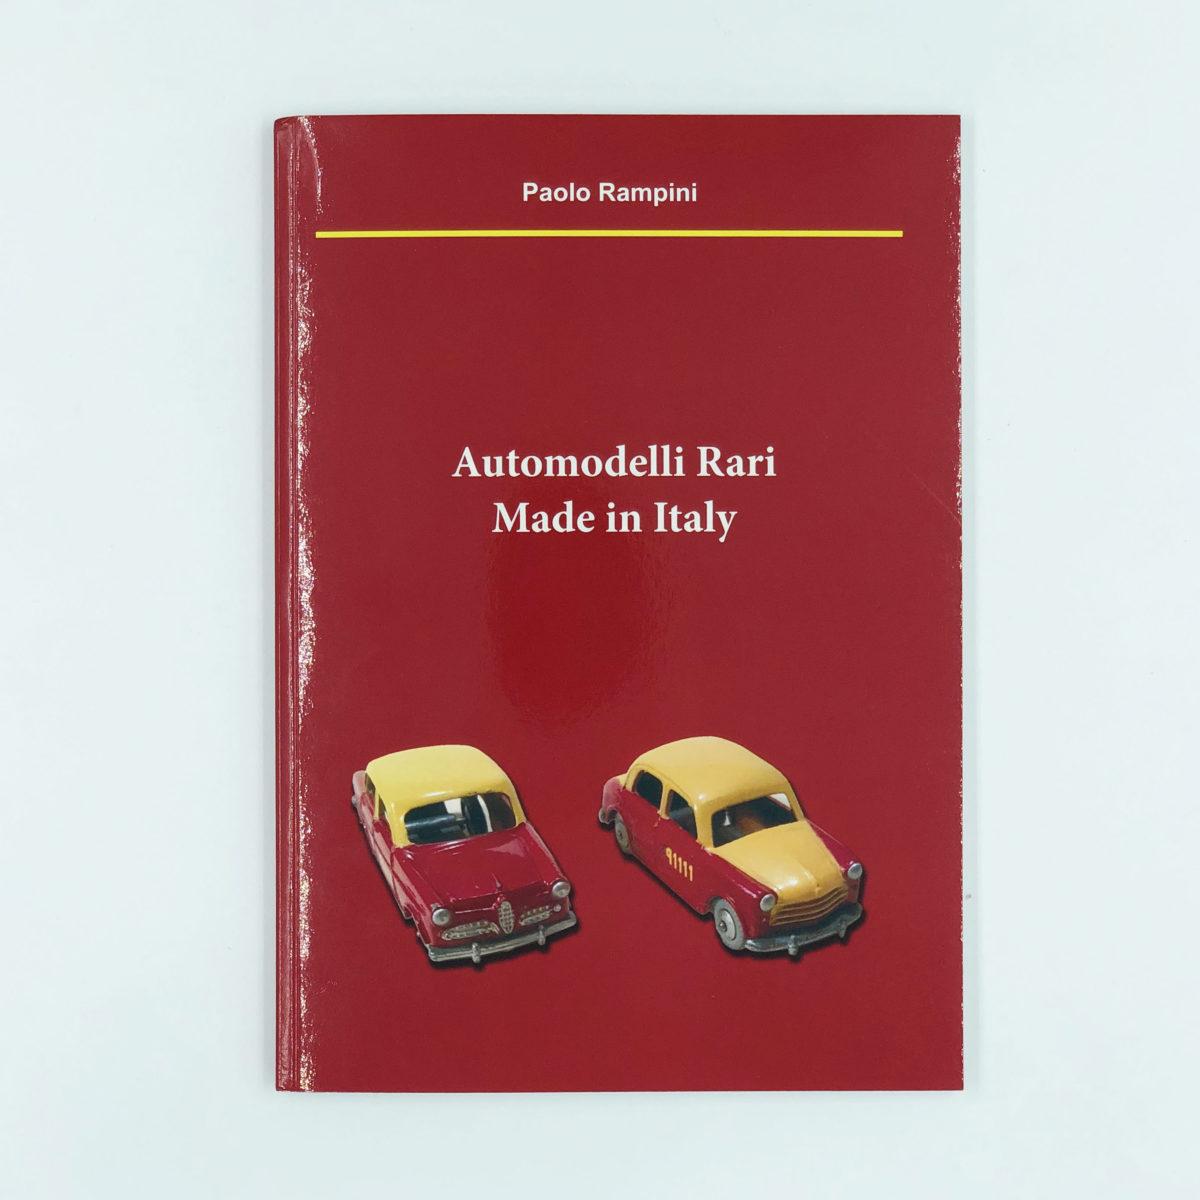 Automodelli Rari Made In Italy - Paolo Rampini